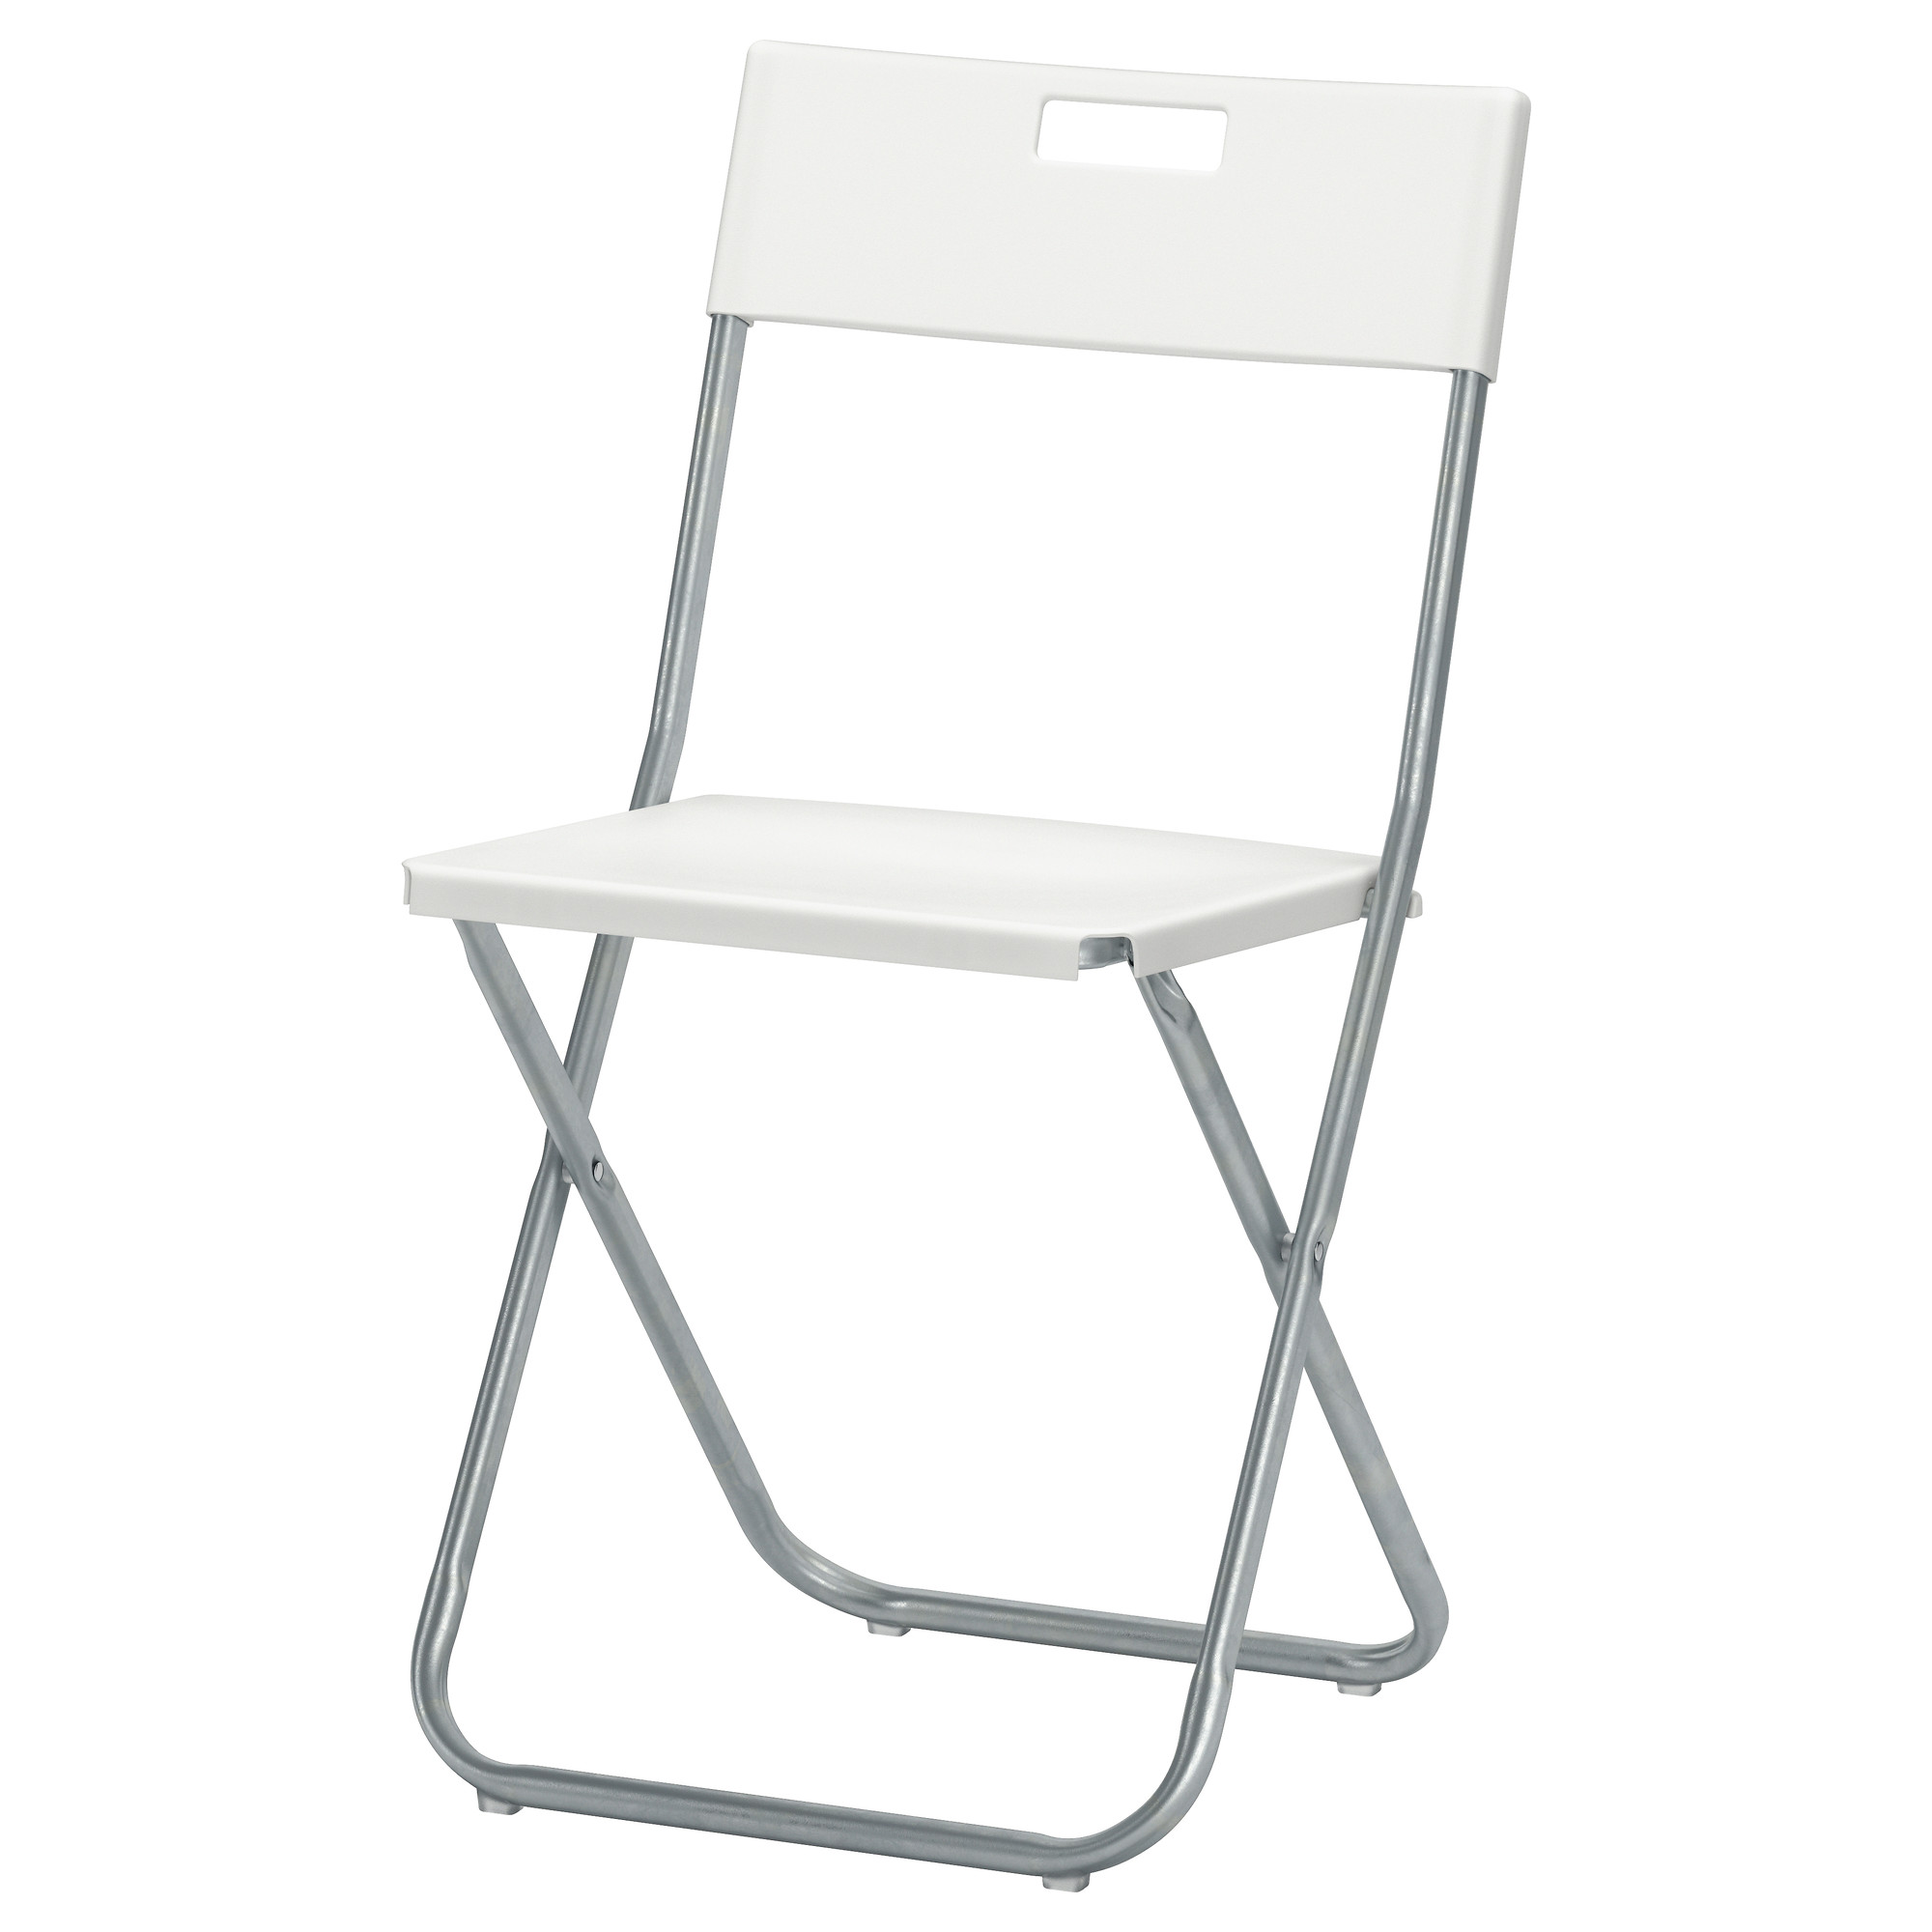 folding chairs gunde folding chair - ikea RHJQLIO